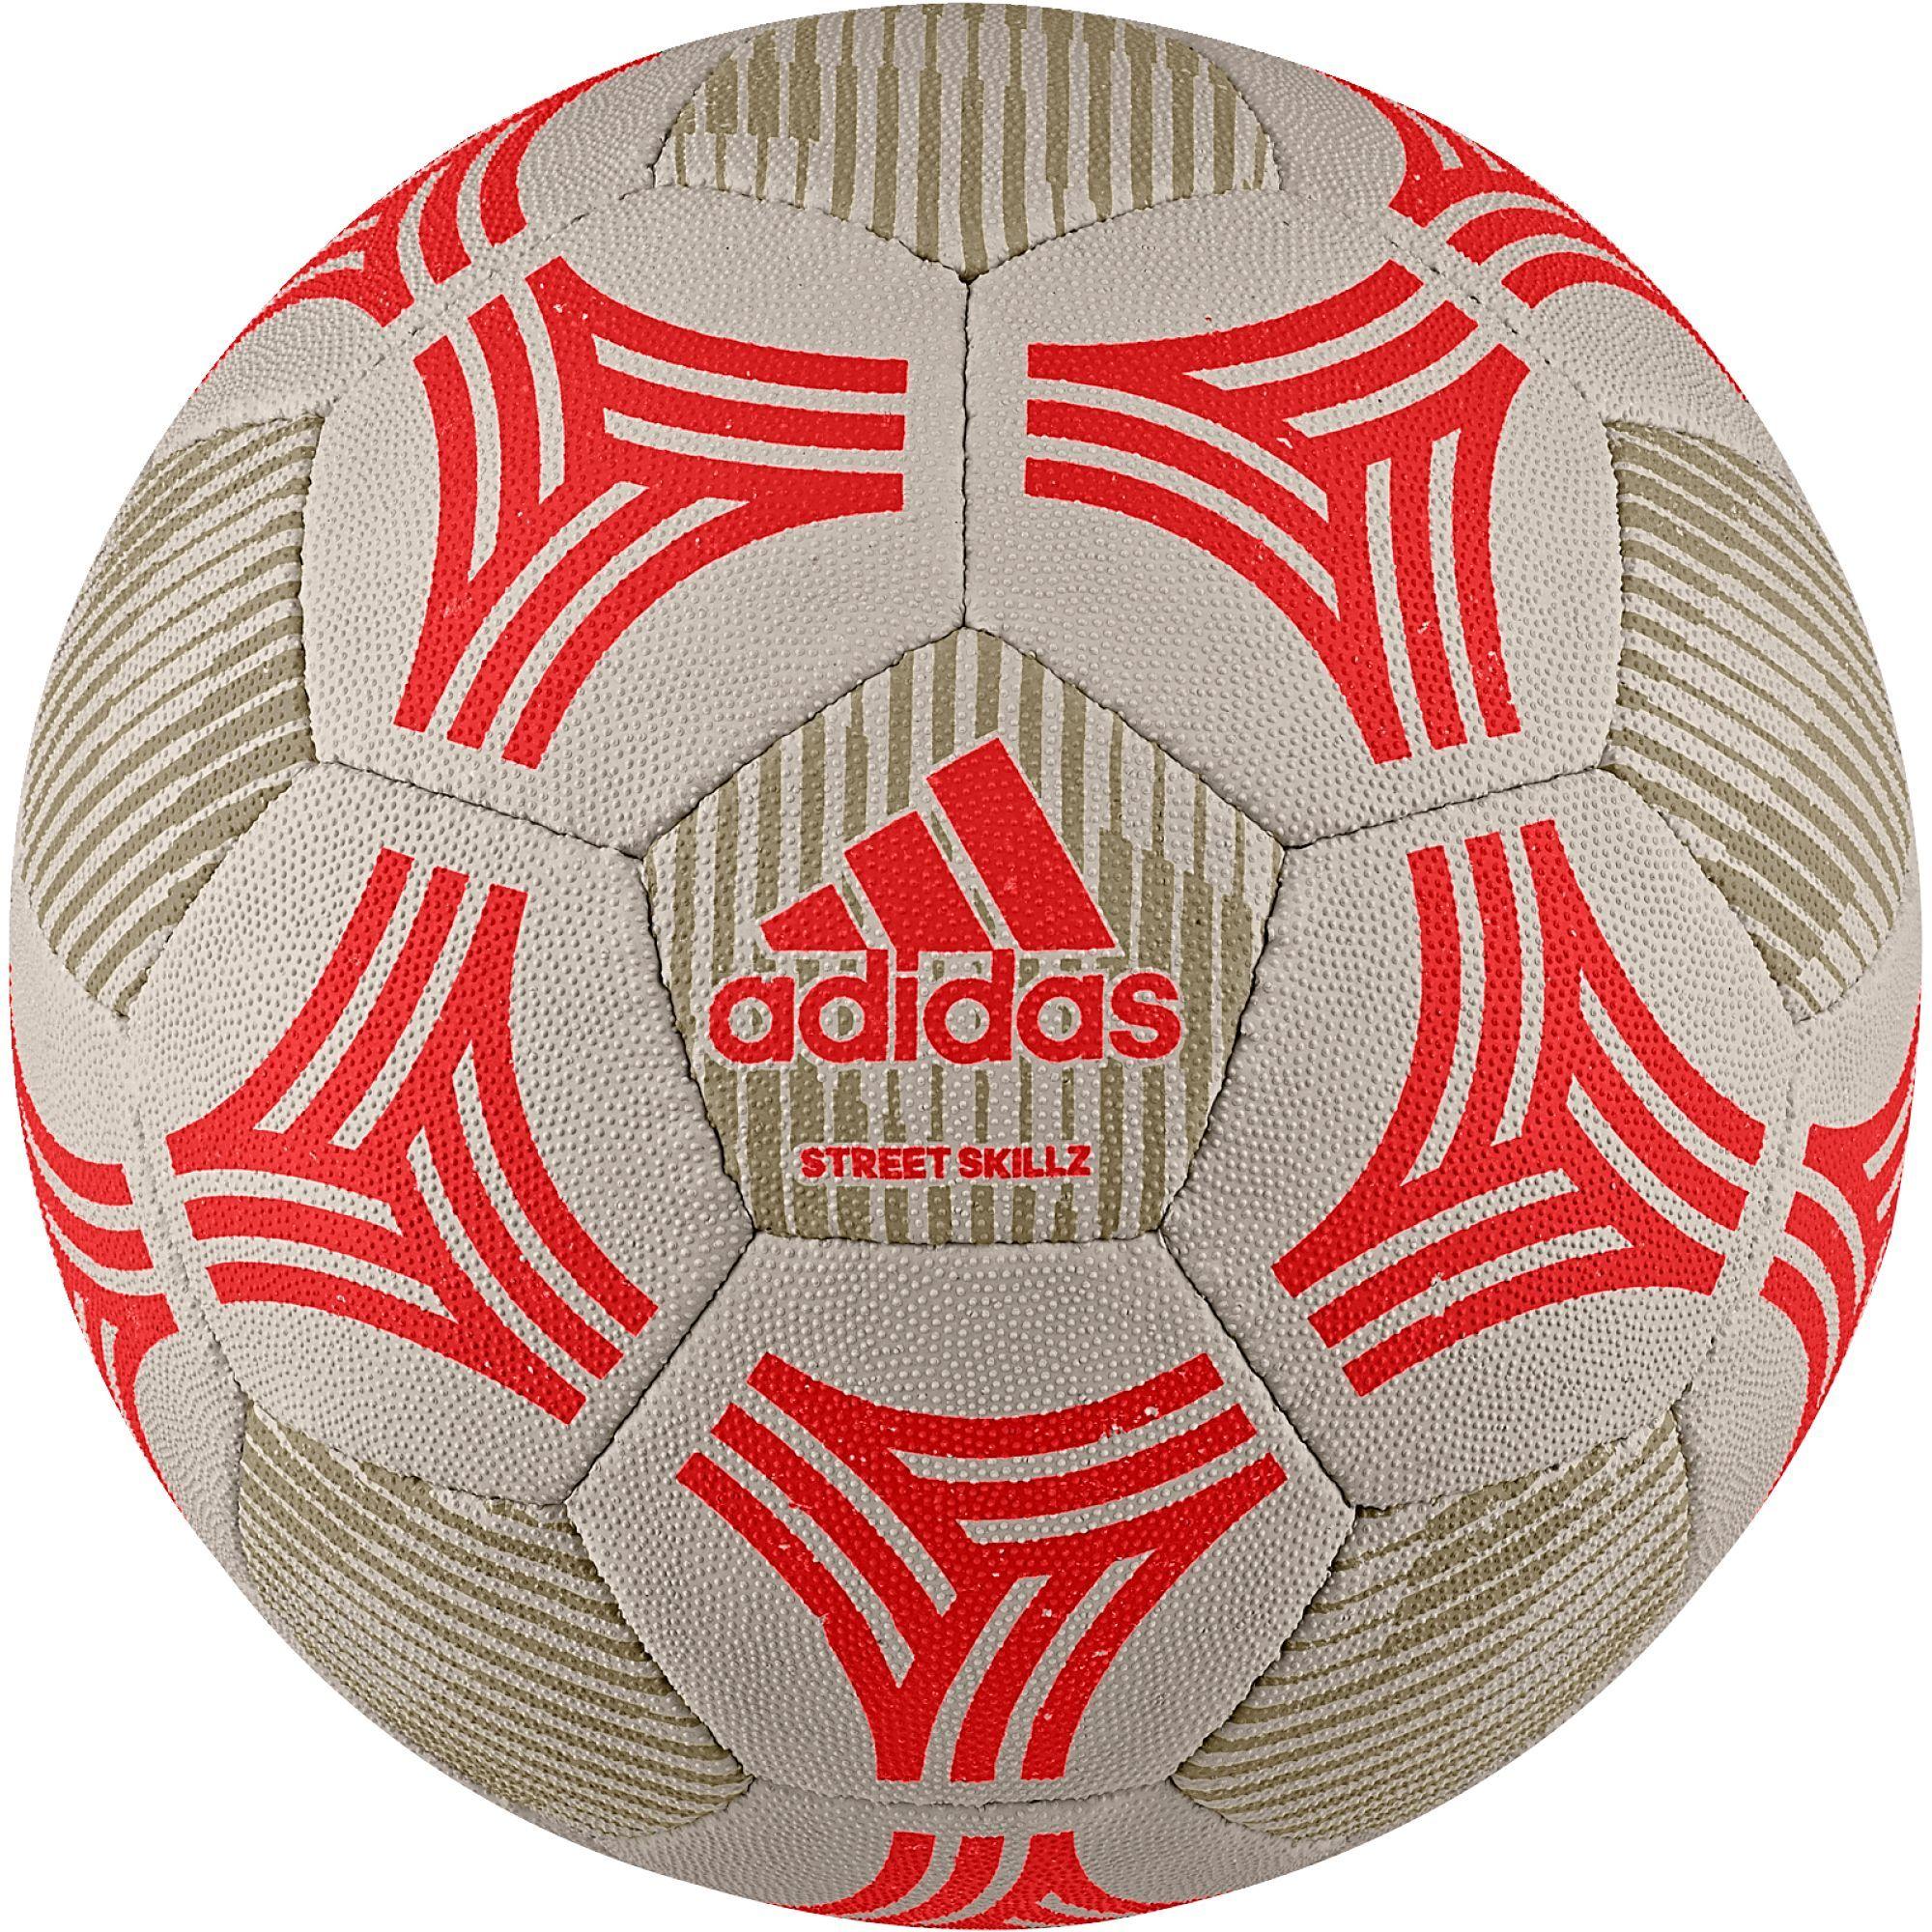 8866f9571 adidas Tango Sala Street Skillz Futsal Ball, Brown | Products ...